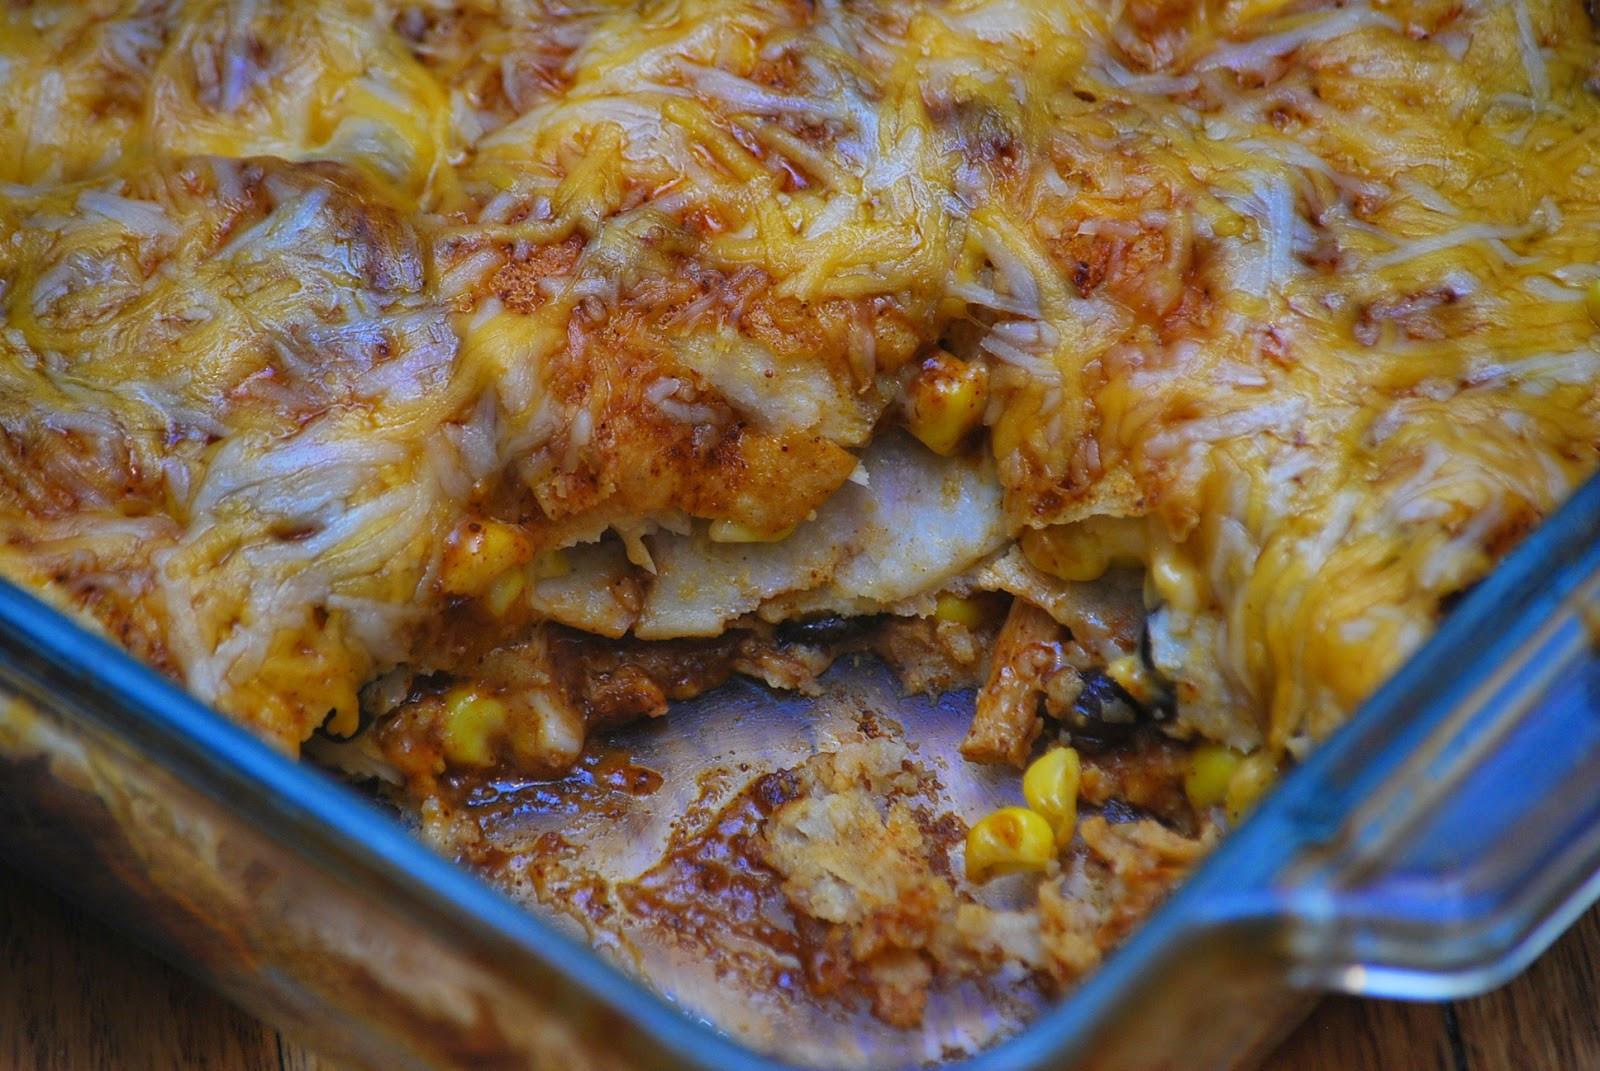 Chicken Enchilada Casserole  My story in recipes Chicken Enchilada Casserole